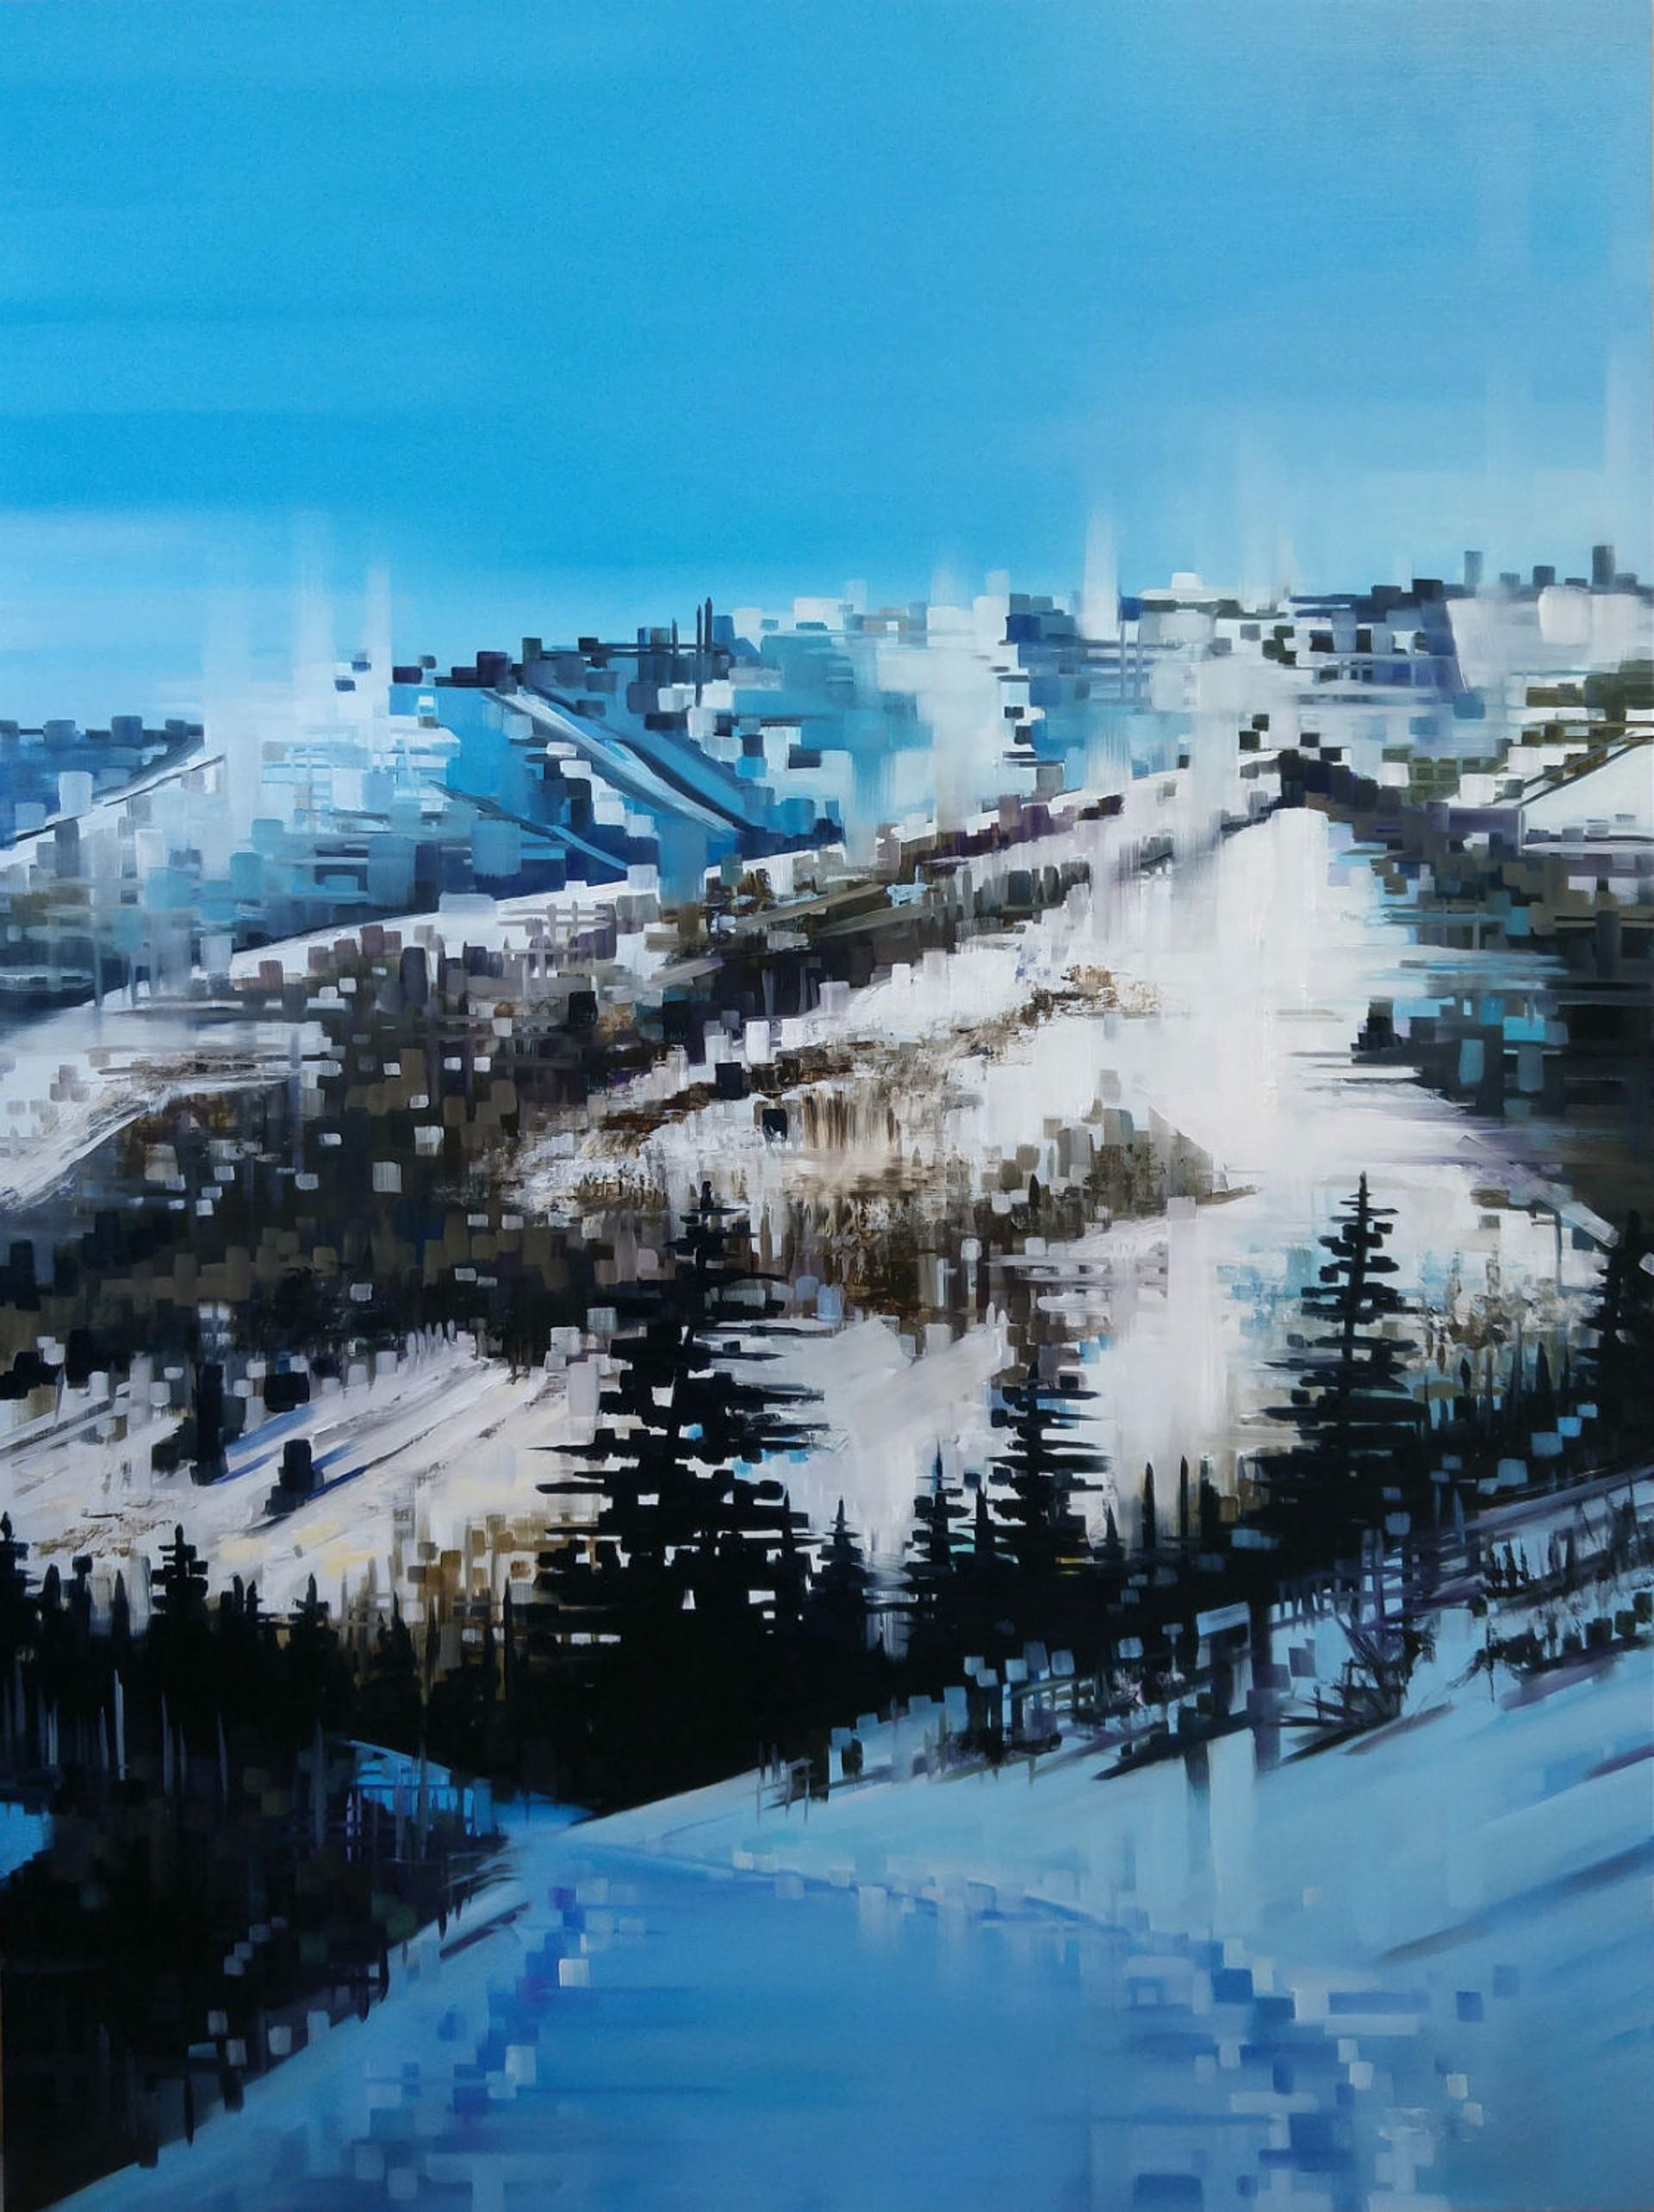 Frozen by Michelle Condrat